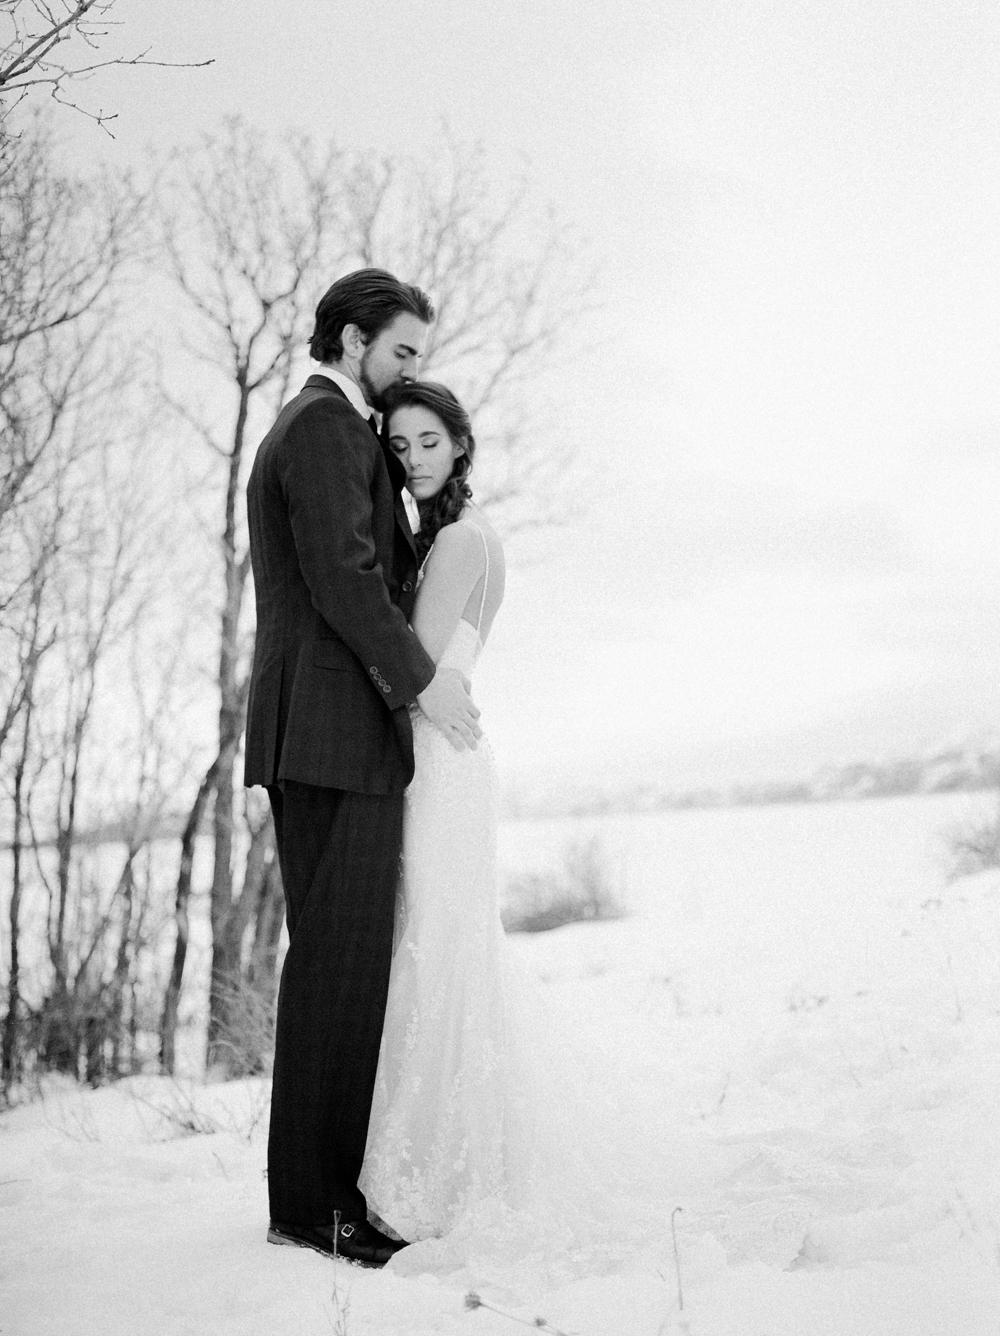 Christine-Gosch-Utah-film-photographer-wedding-mountains-snow-snowy-destination-6.jpg